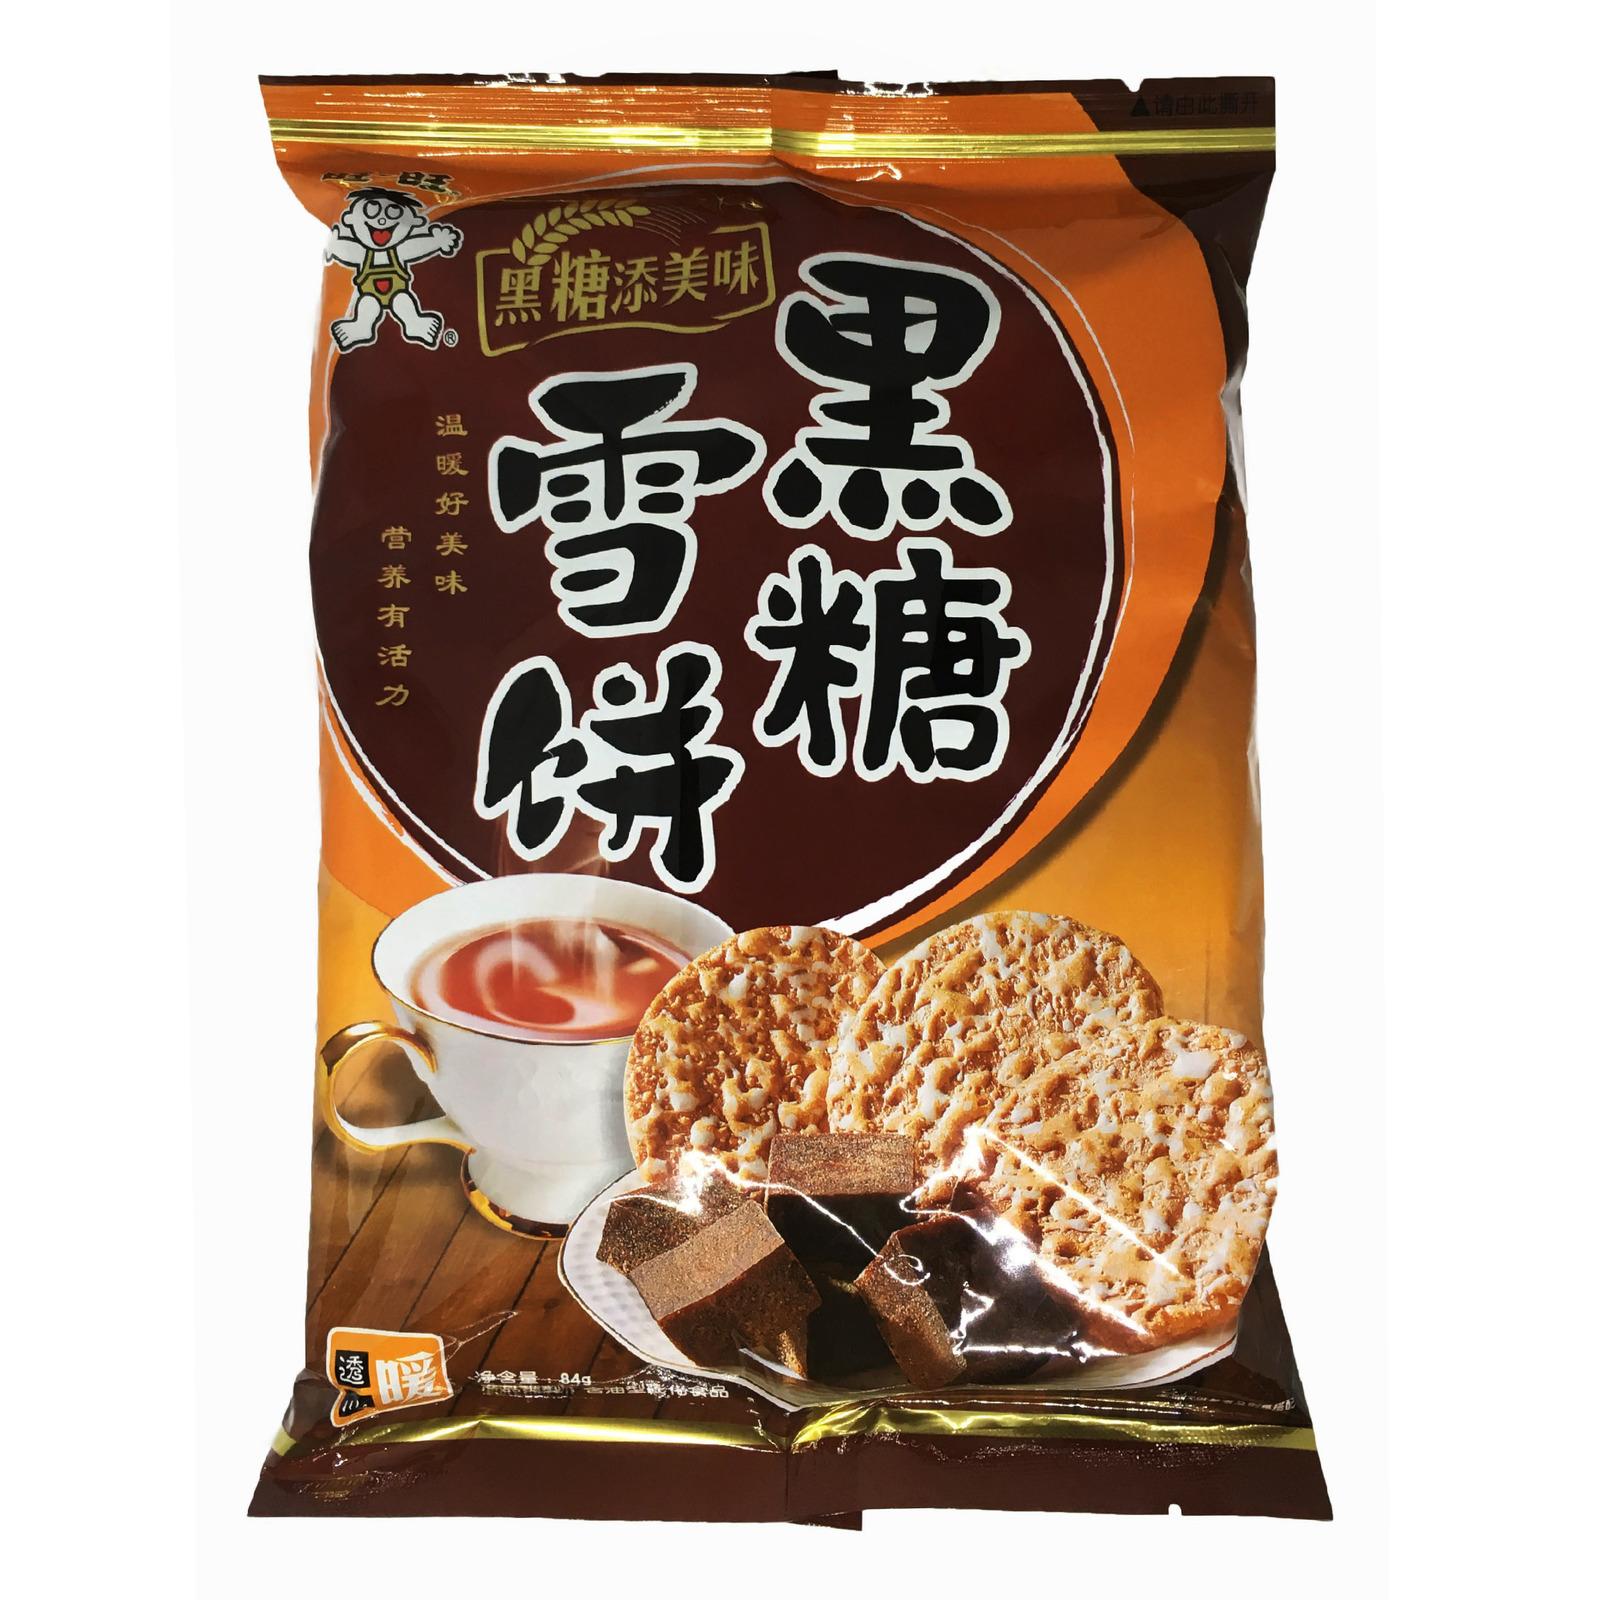 Want Want Rice Crackers - Brown Sugar